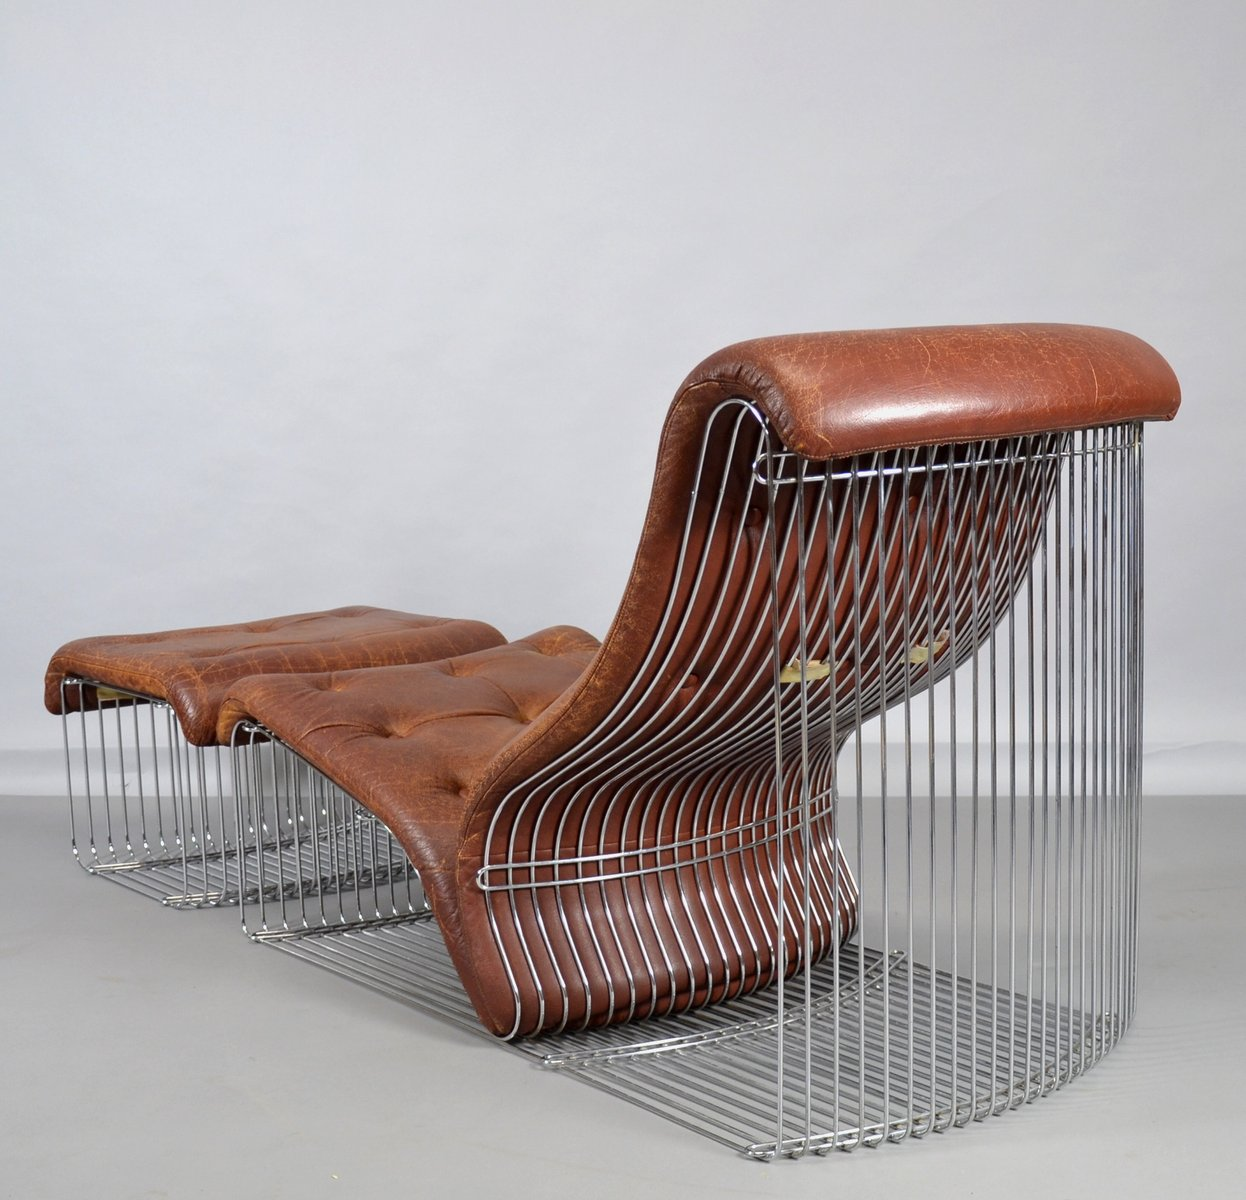 vintage pantonova sessel mit ottomane von verner panton f r fritz hansen bei pamono kaufen. Black Bedroom Furniture Sets. Home Design Ideas